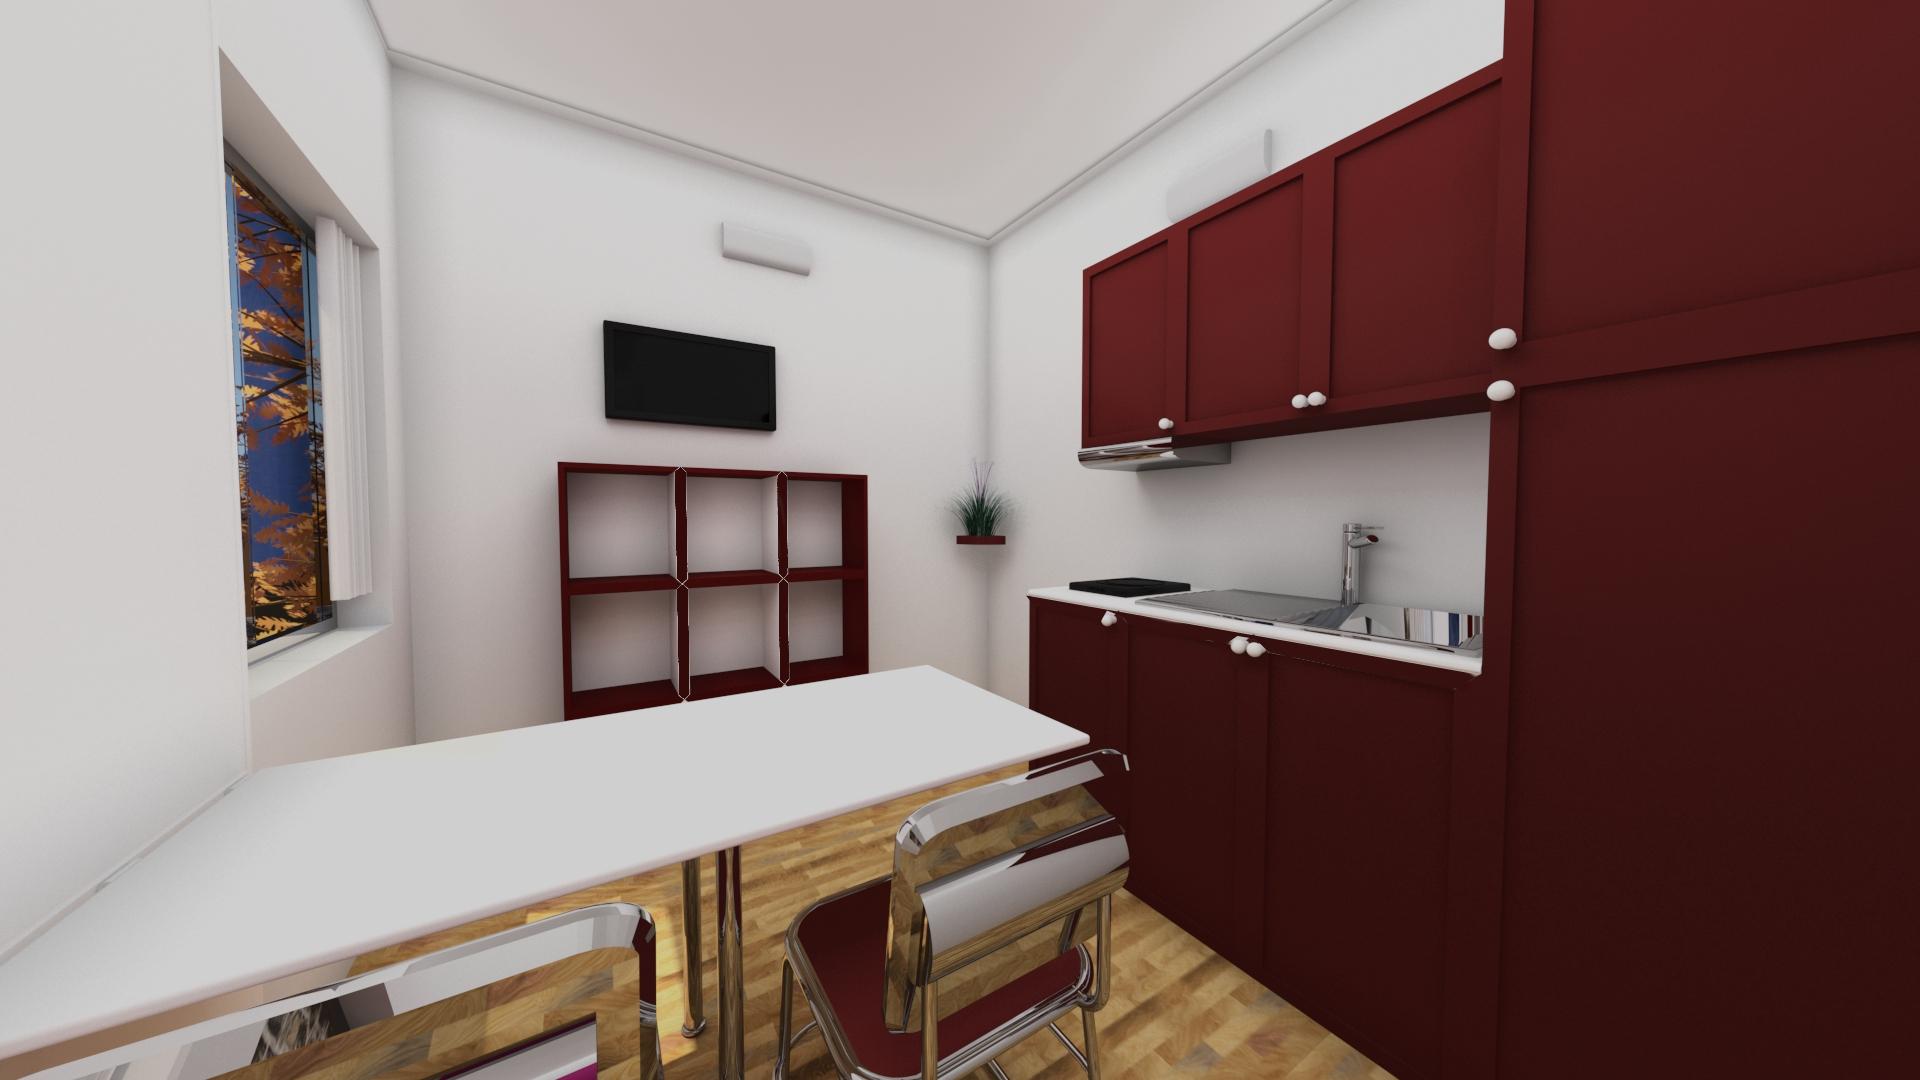 25 Mq Interno Cucina